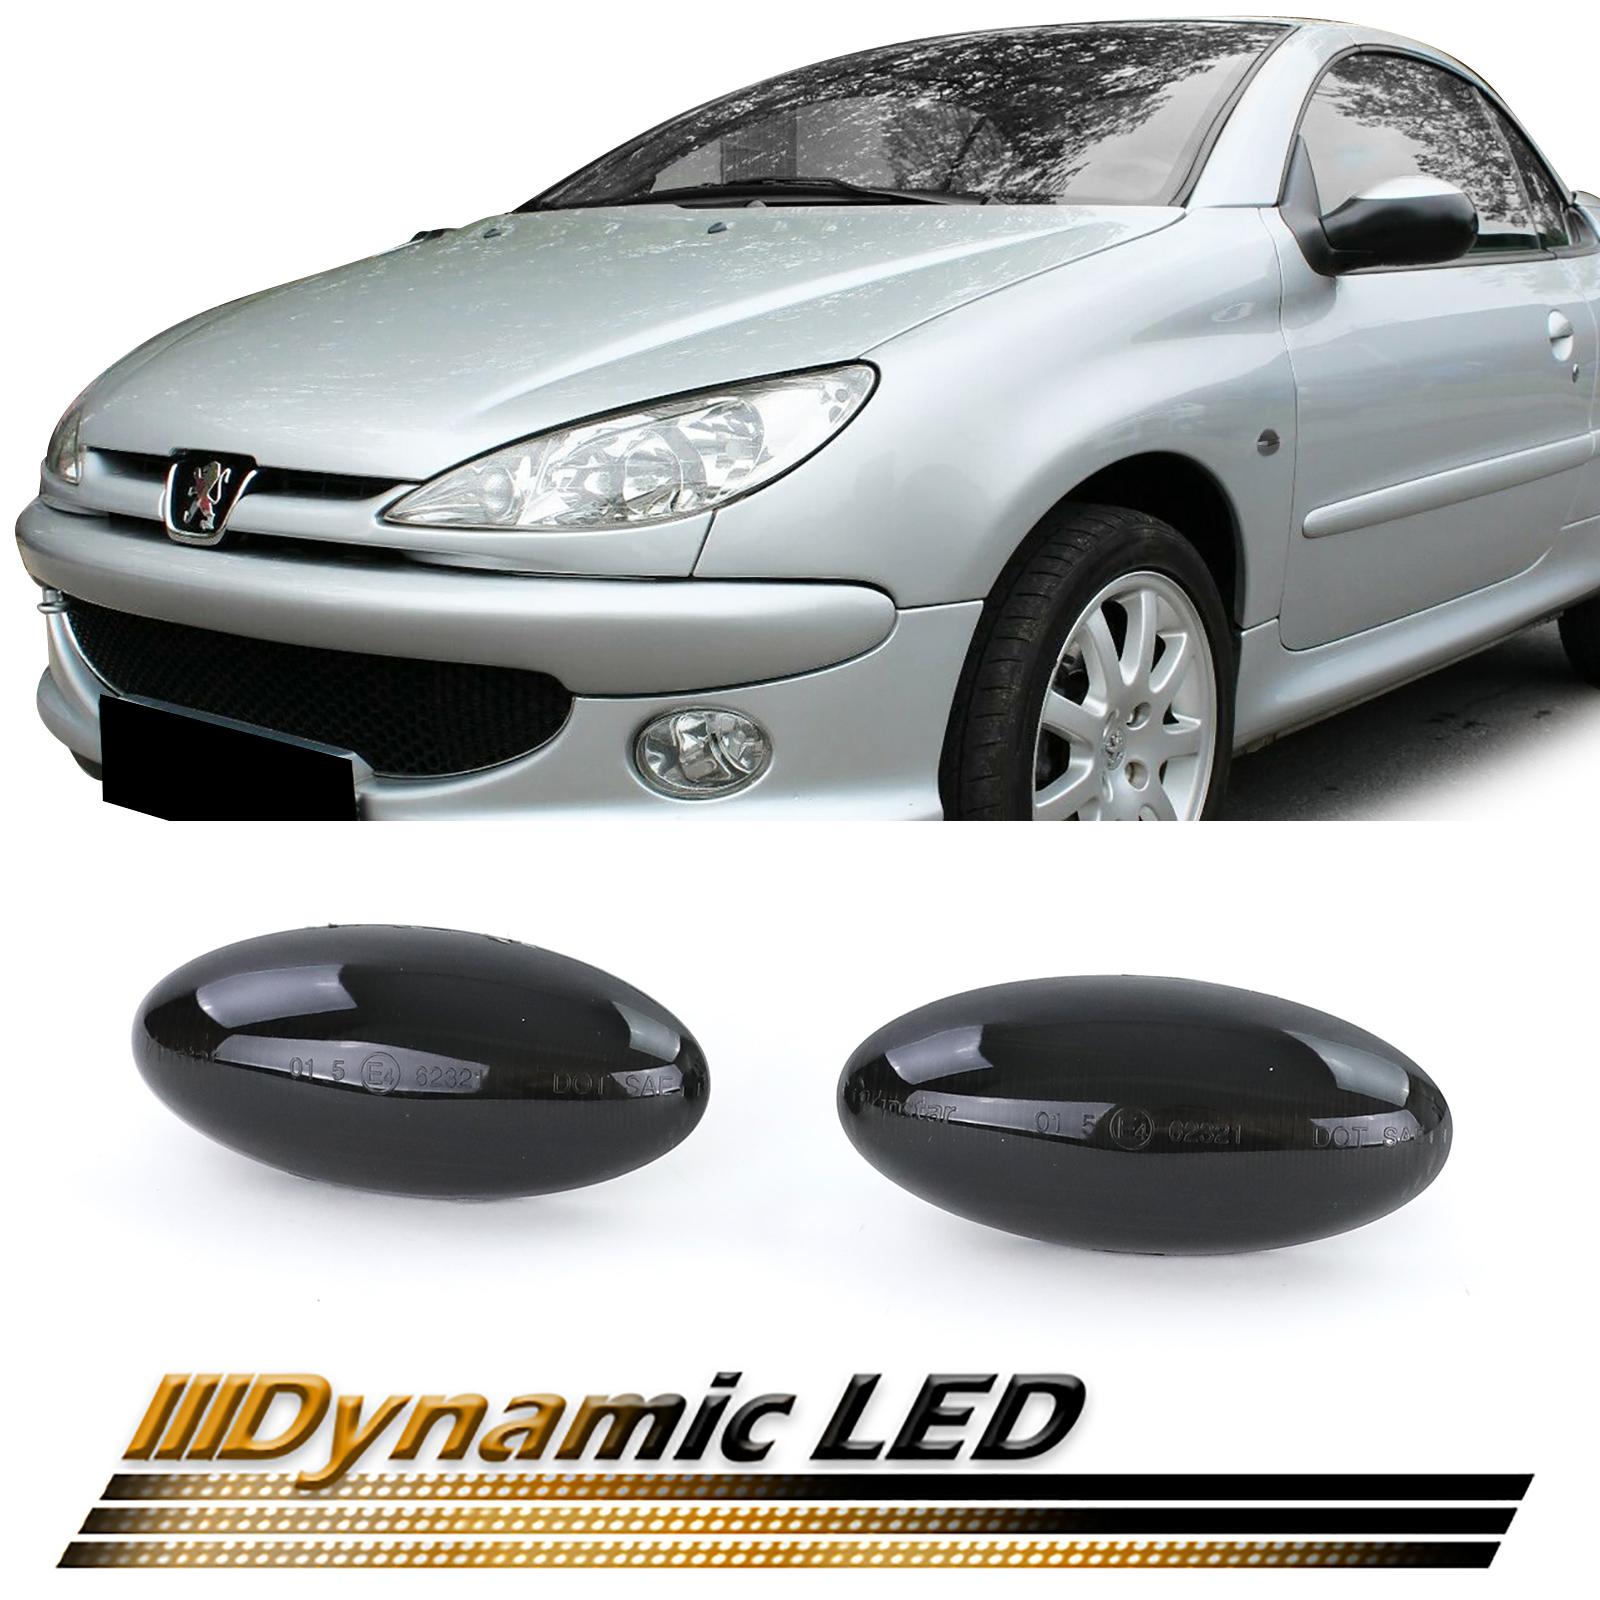 Laterais Dinamicos Fumado Peugeot 206 307 4007 407